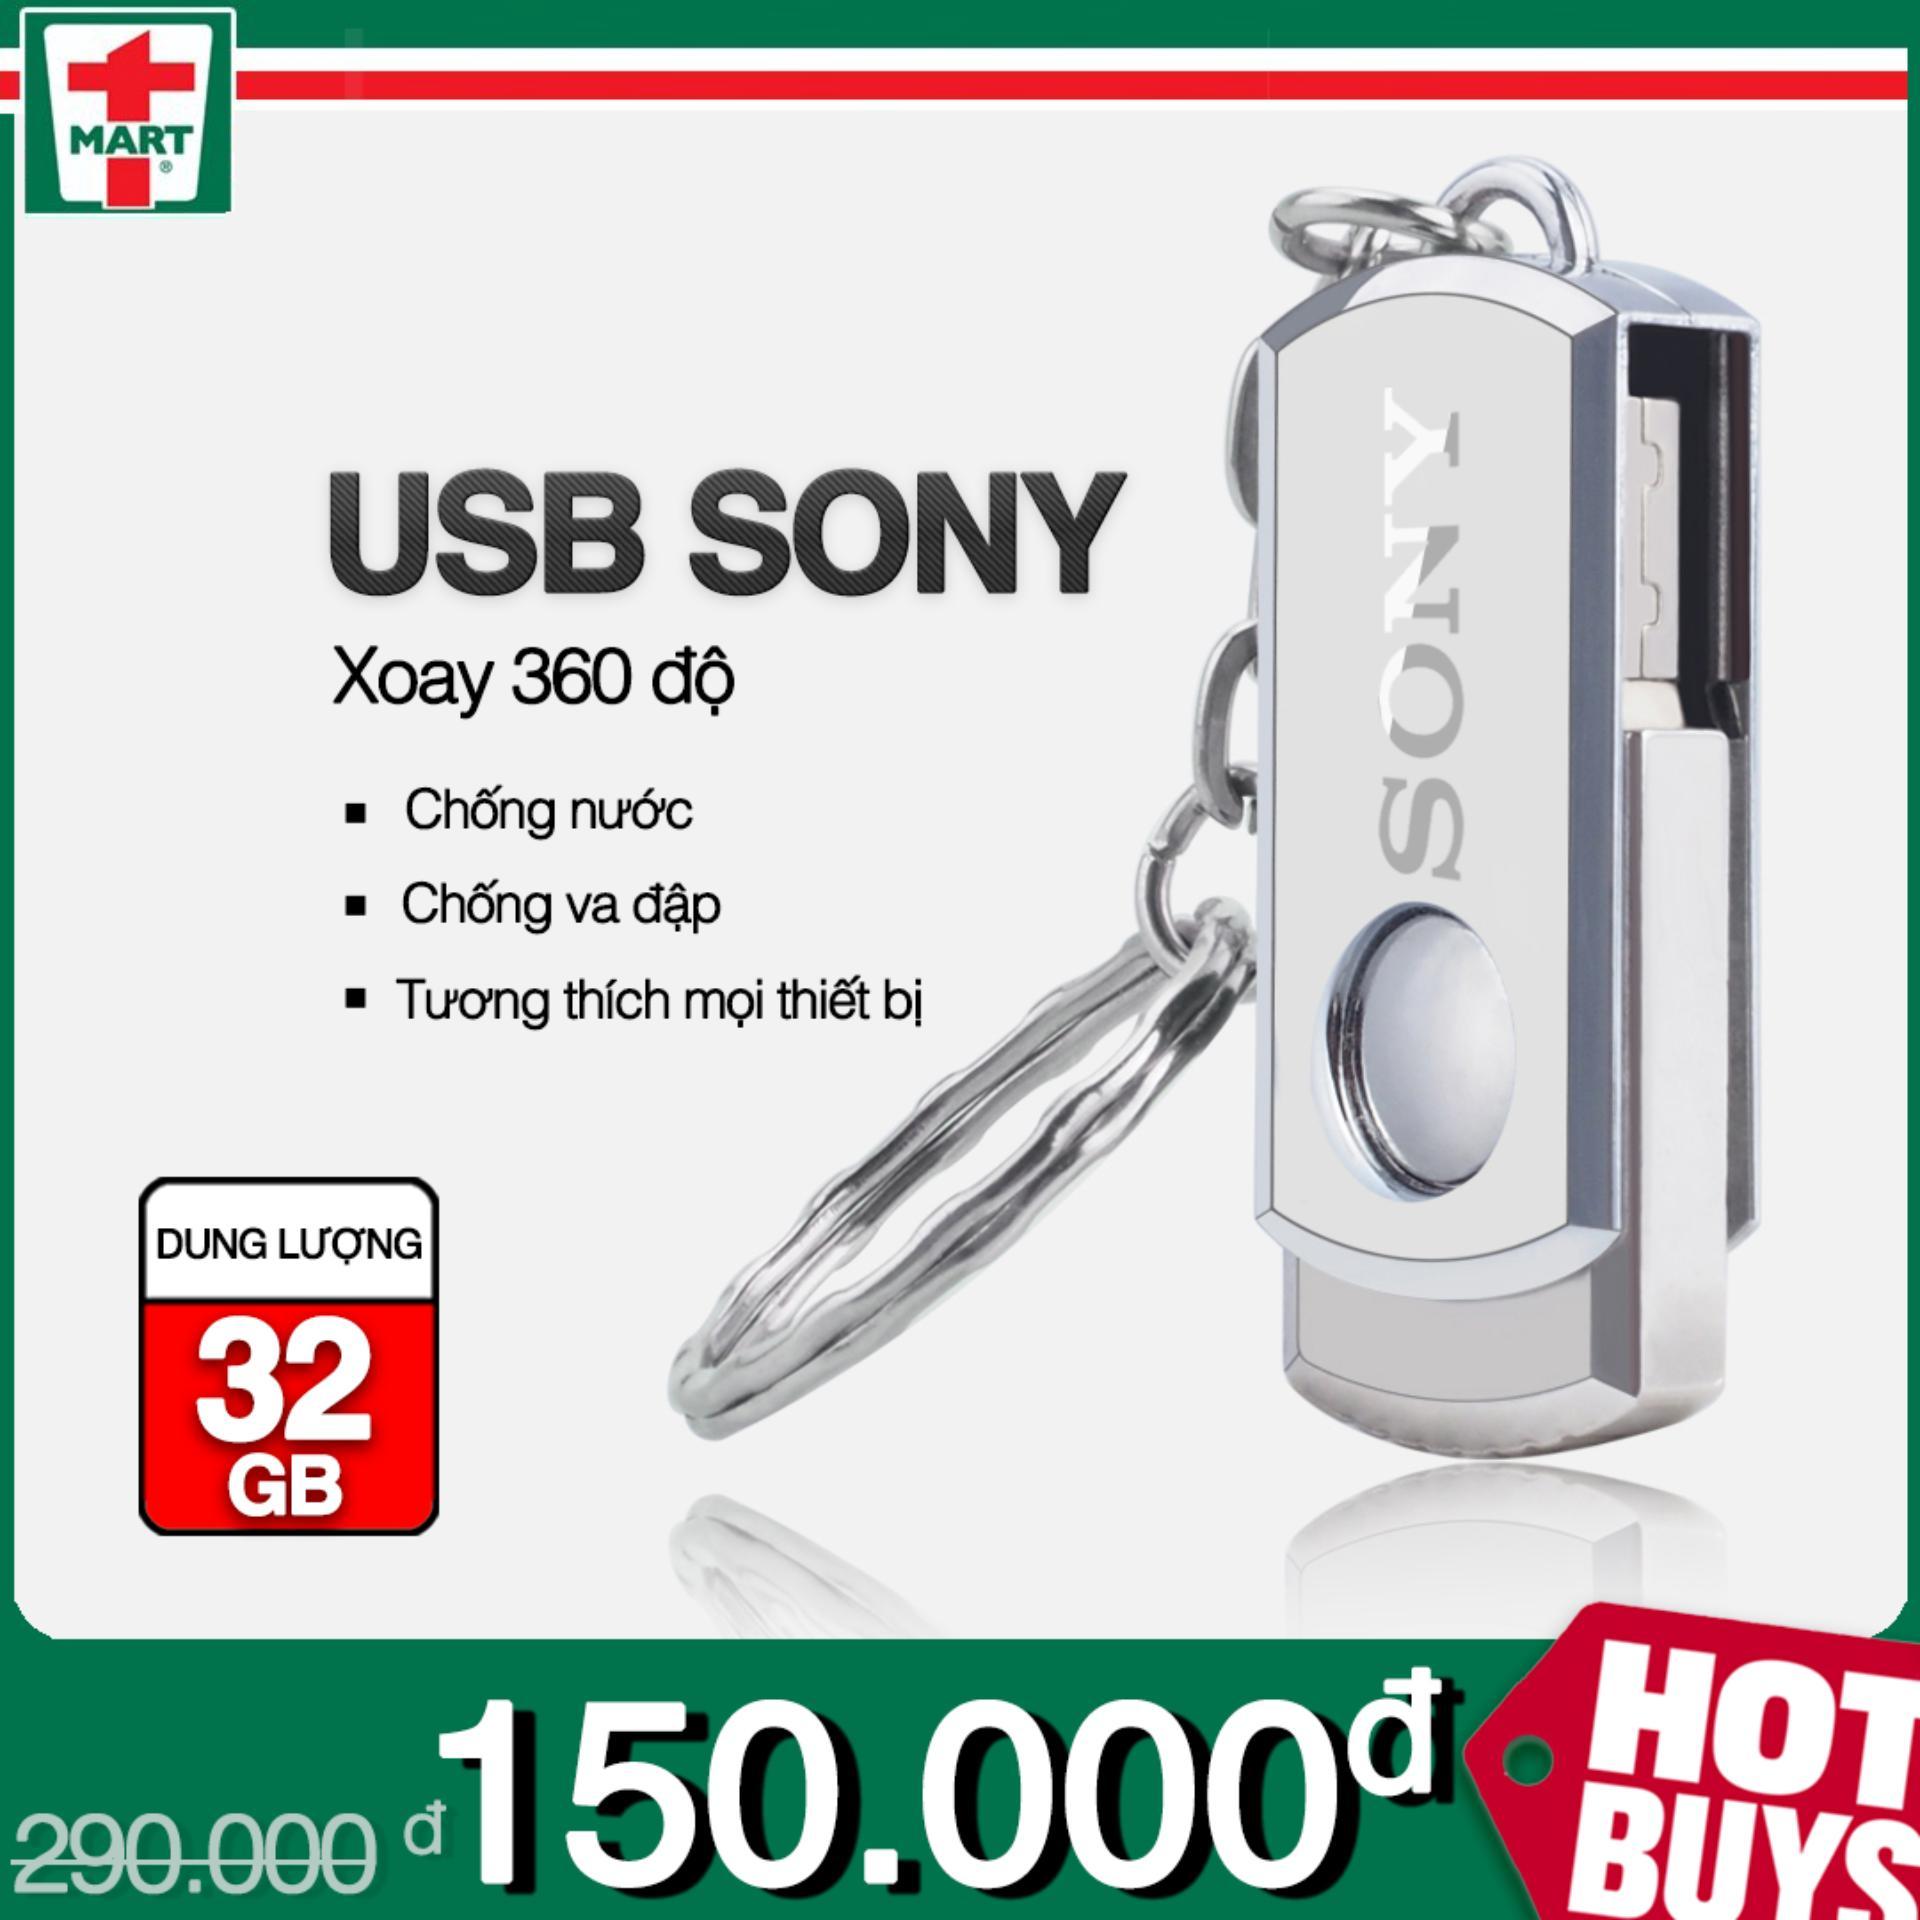 USB 32GB 2.0 Sony INOX hộp kim loại